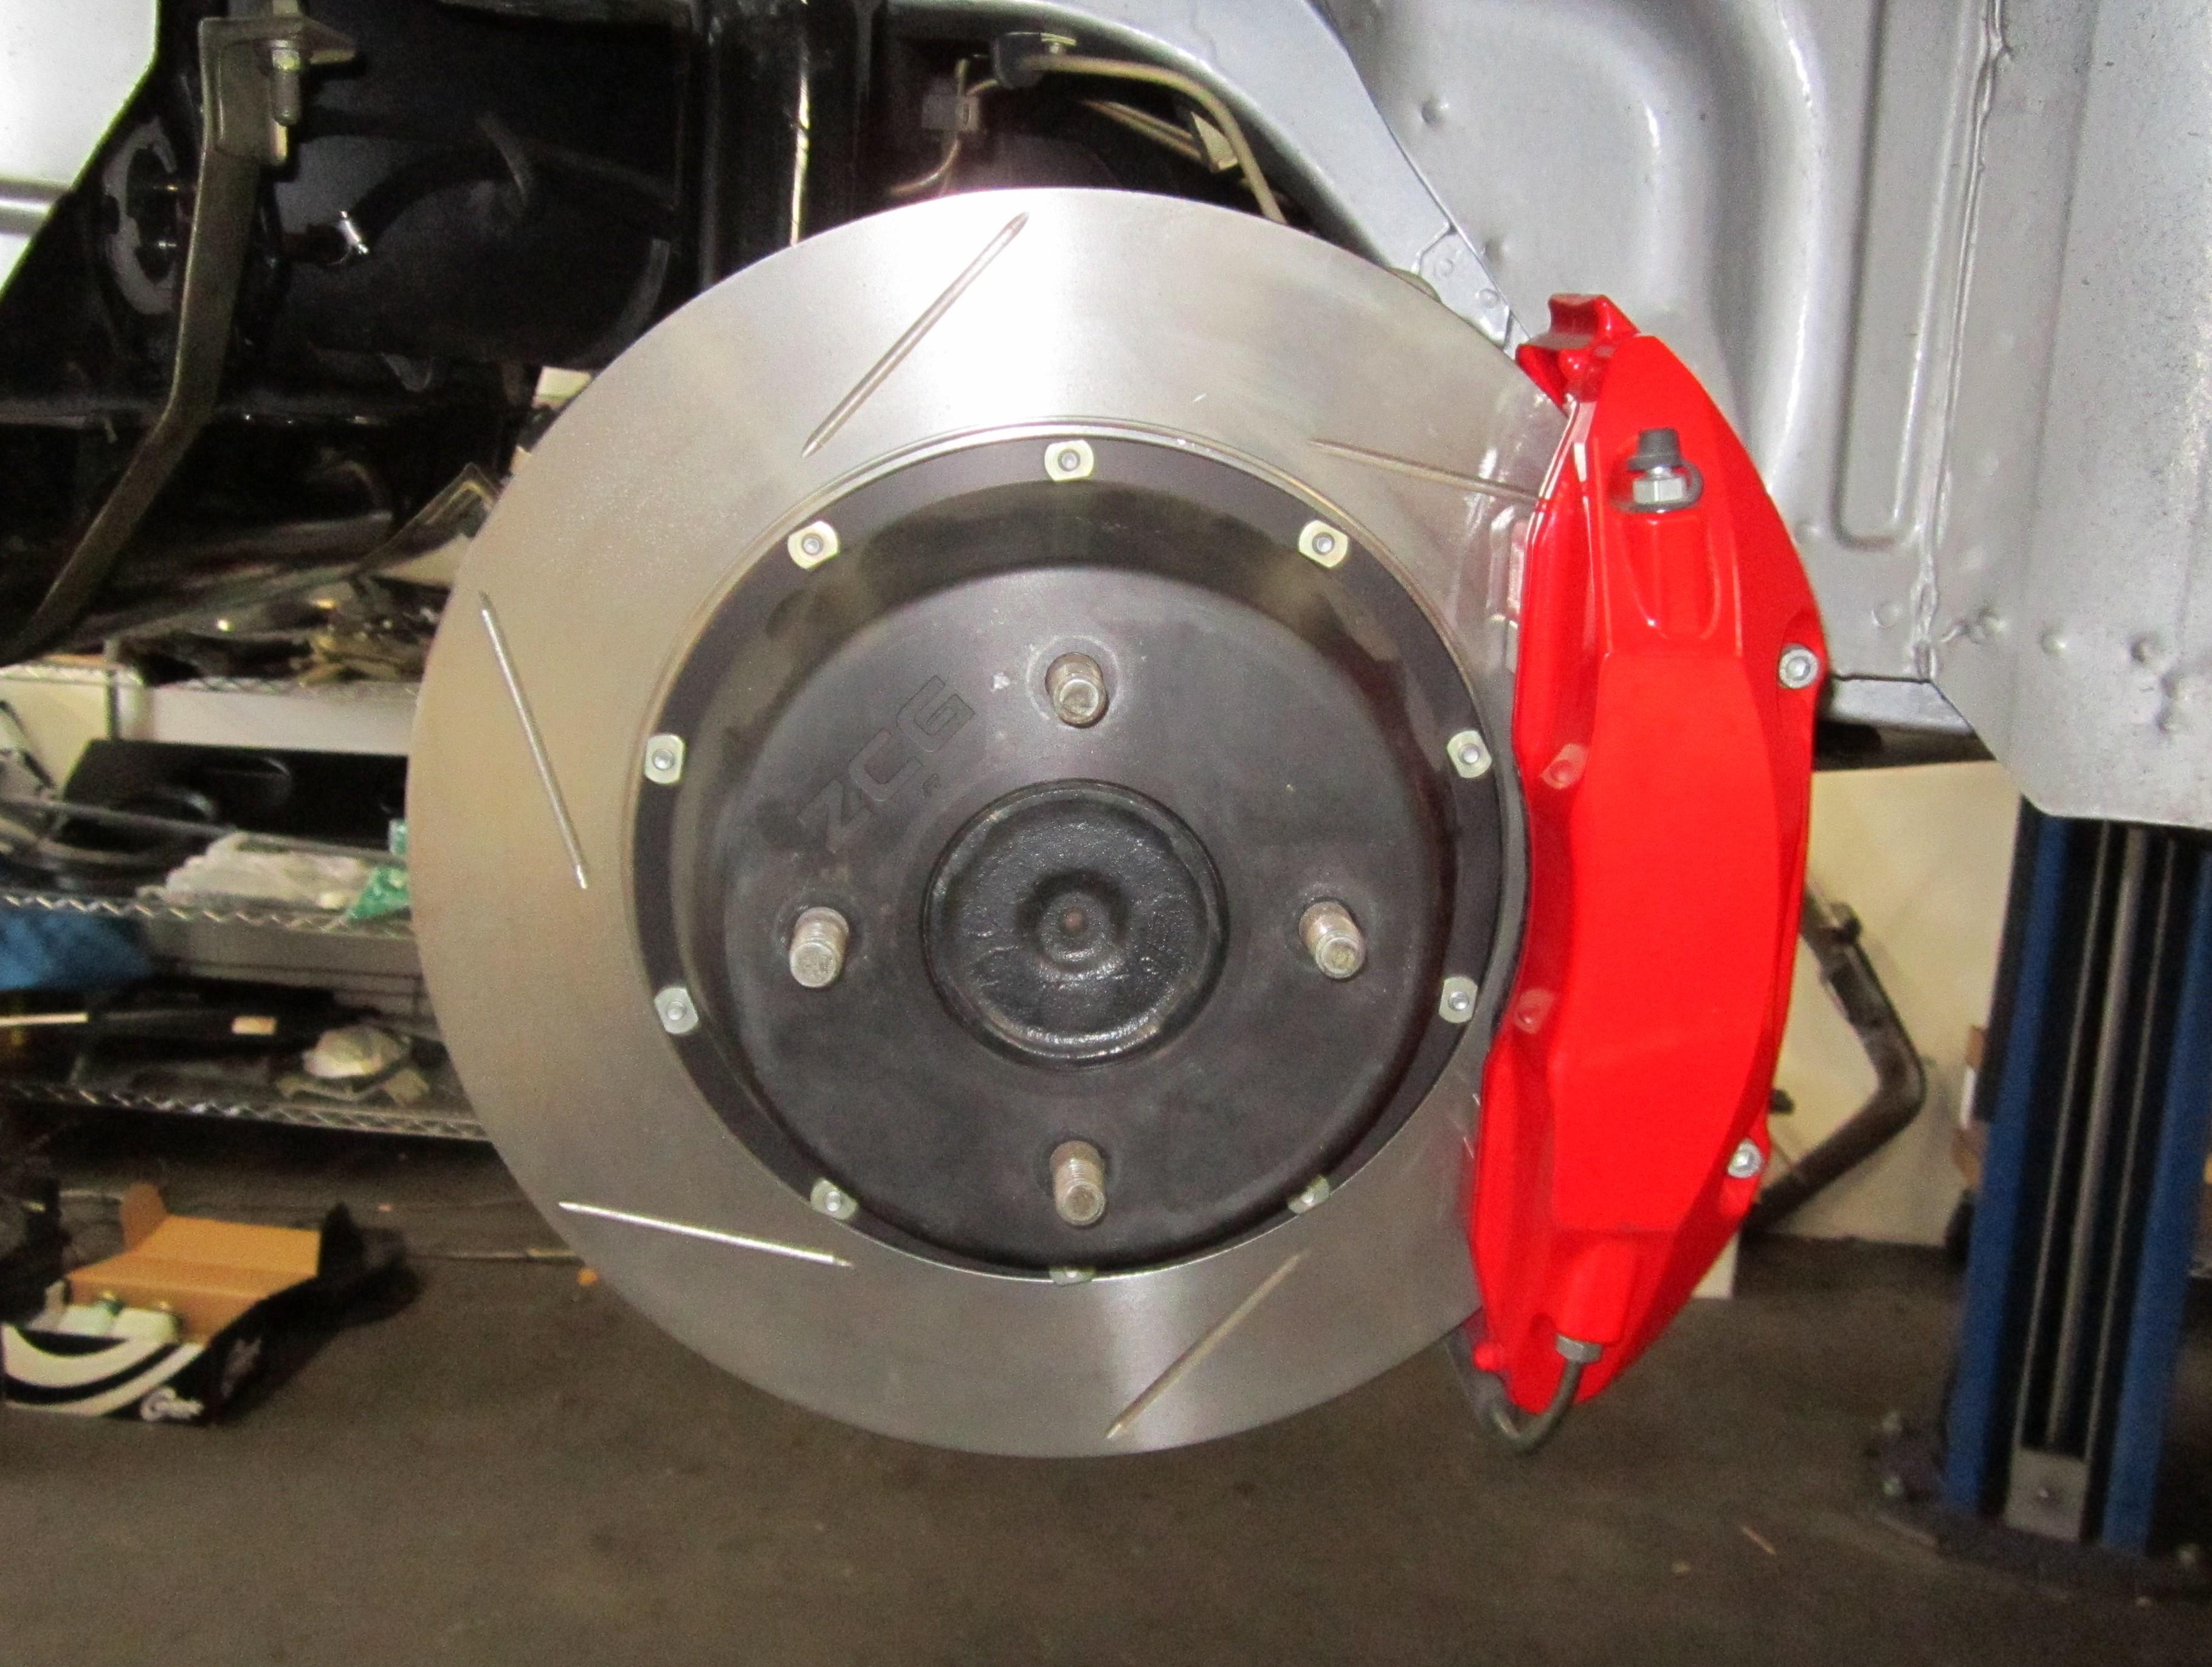 Z-Car Blog » Post Topic » Balancing the Beast: Big Brakes